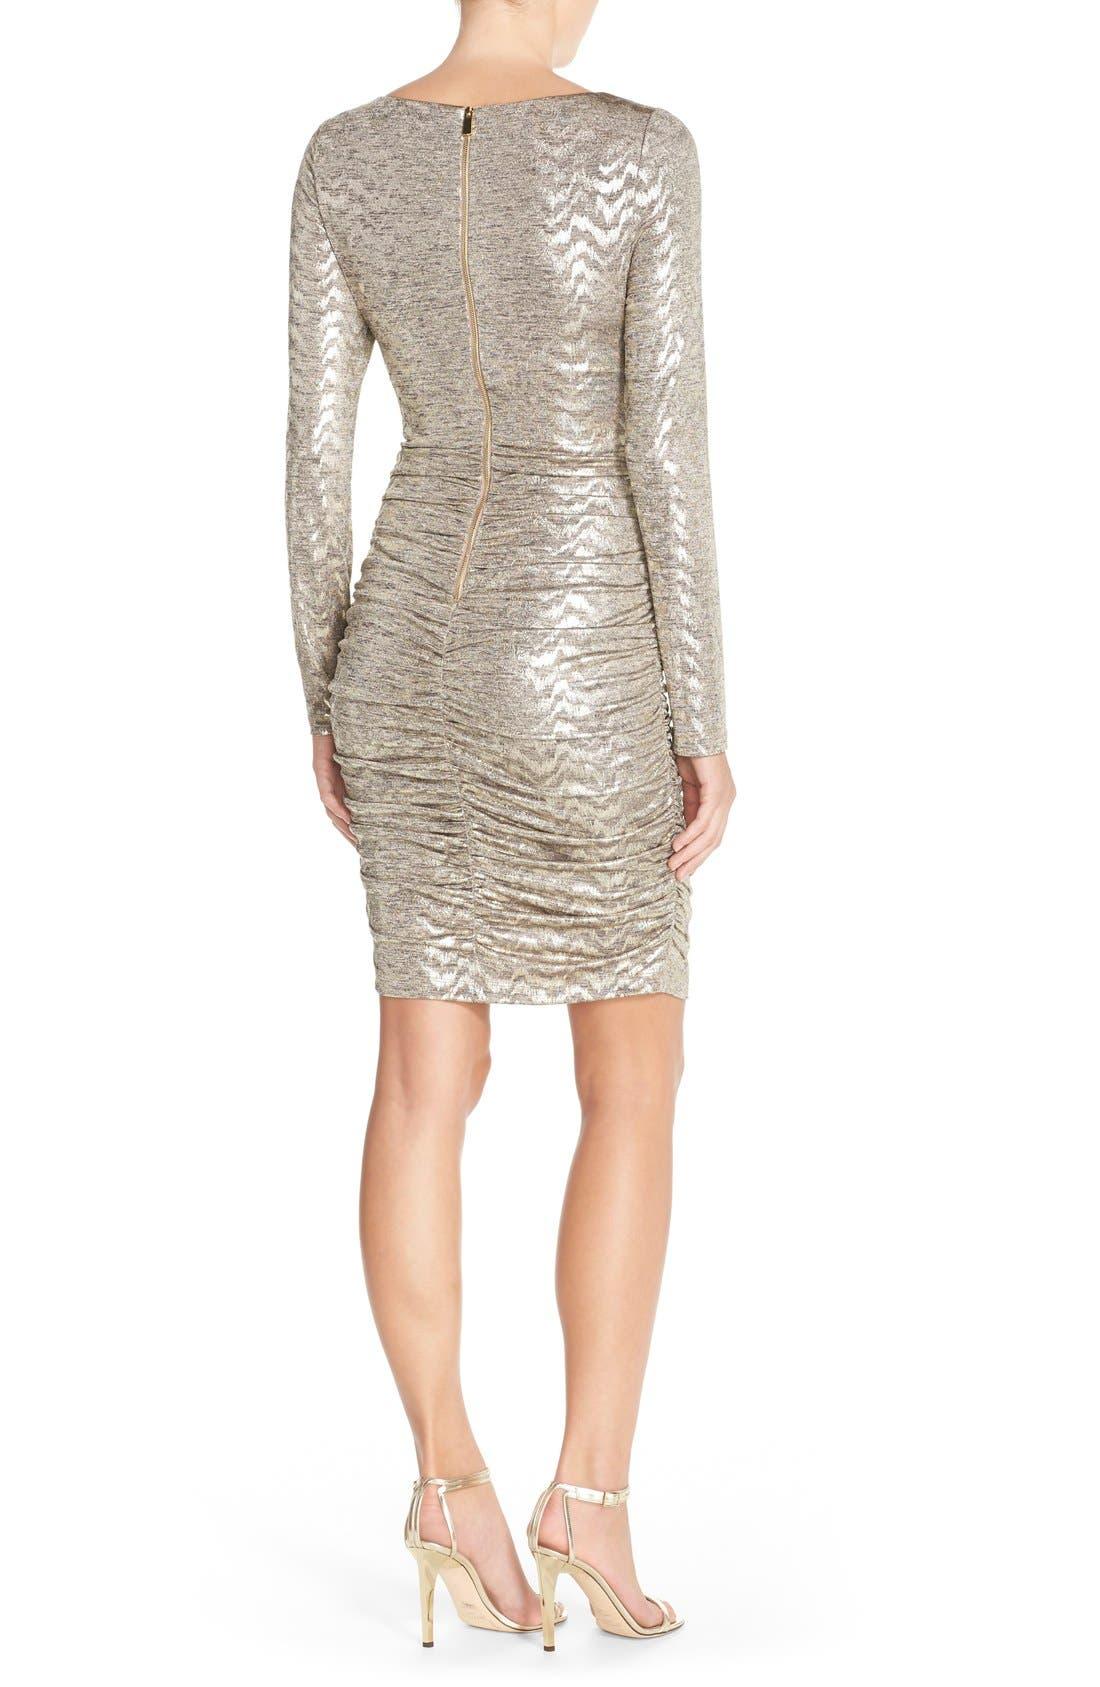 VINCE CAMUTO, Metallic Jersey Body-Con Dress, Alternate thumbnail 3, color, 710